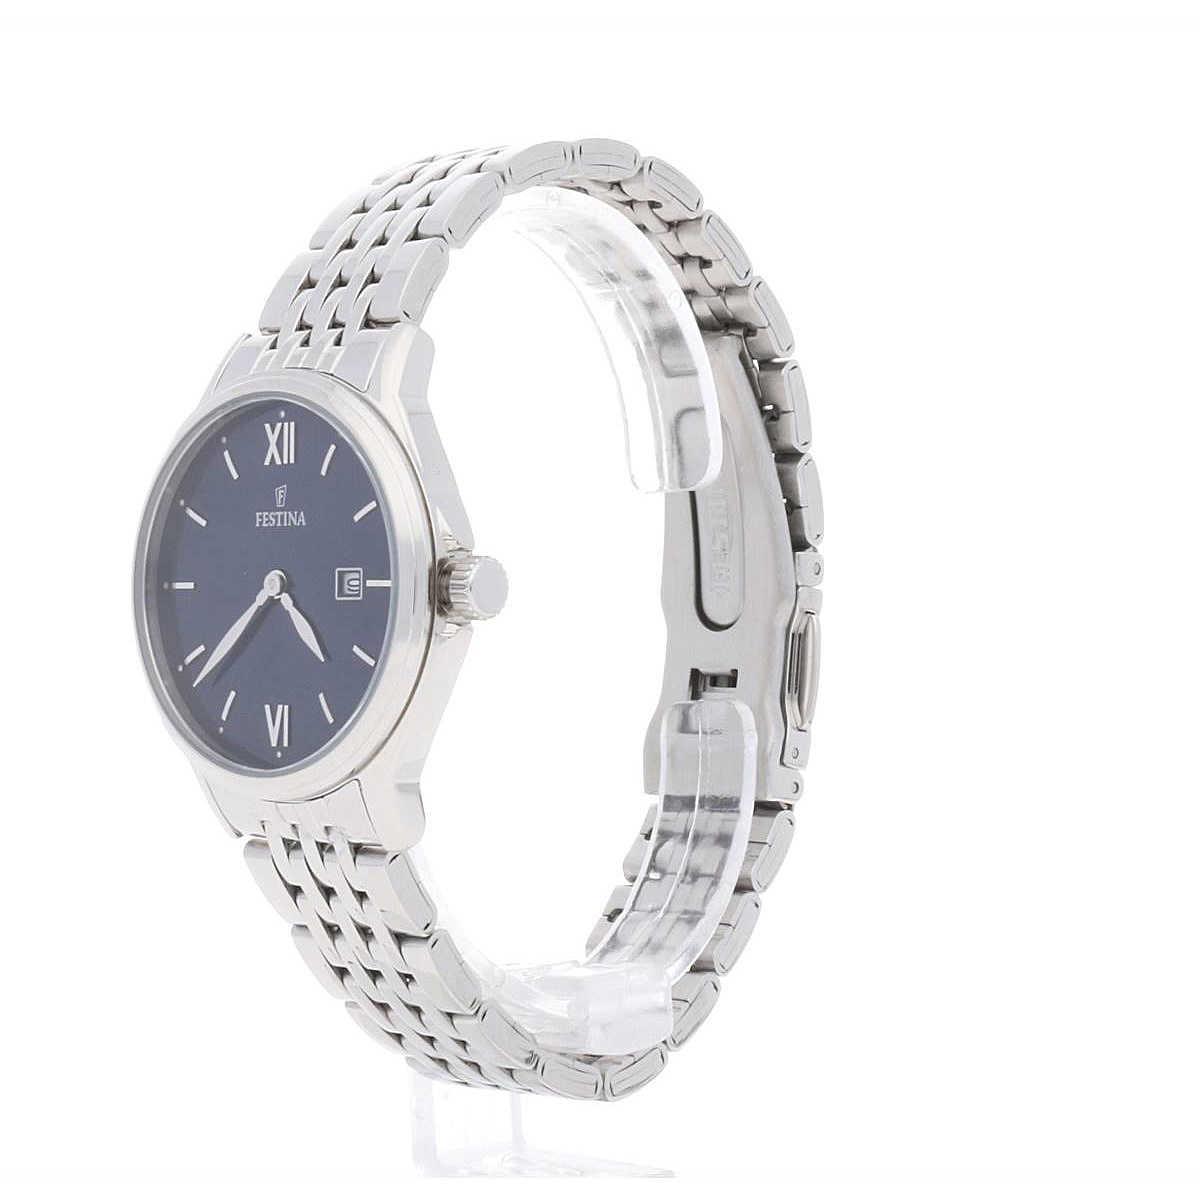 Uhr Frau Clasico Acero Nur Zeit F167483 Festina yf7b6g